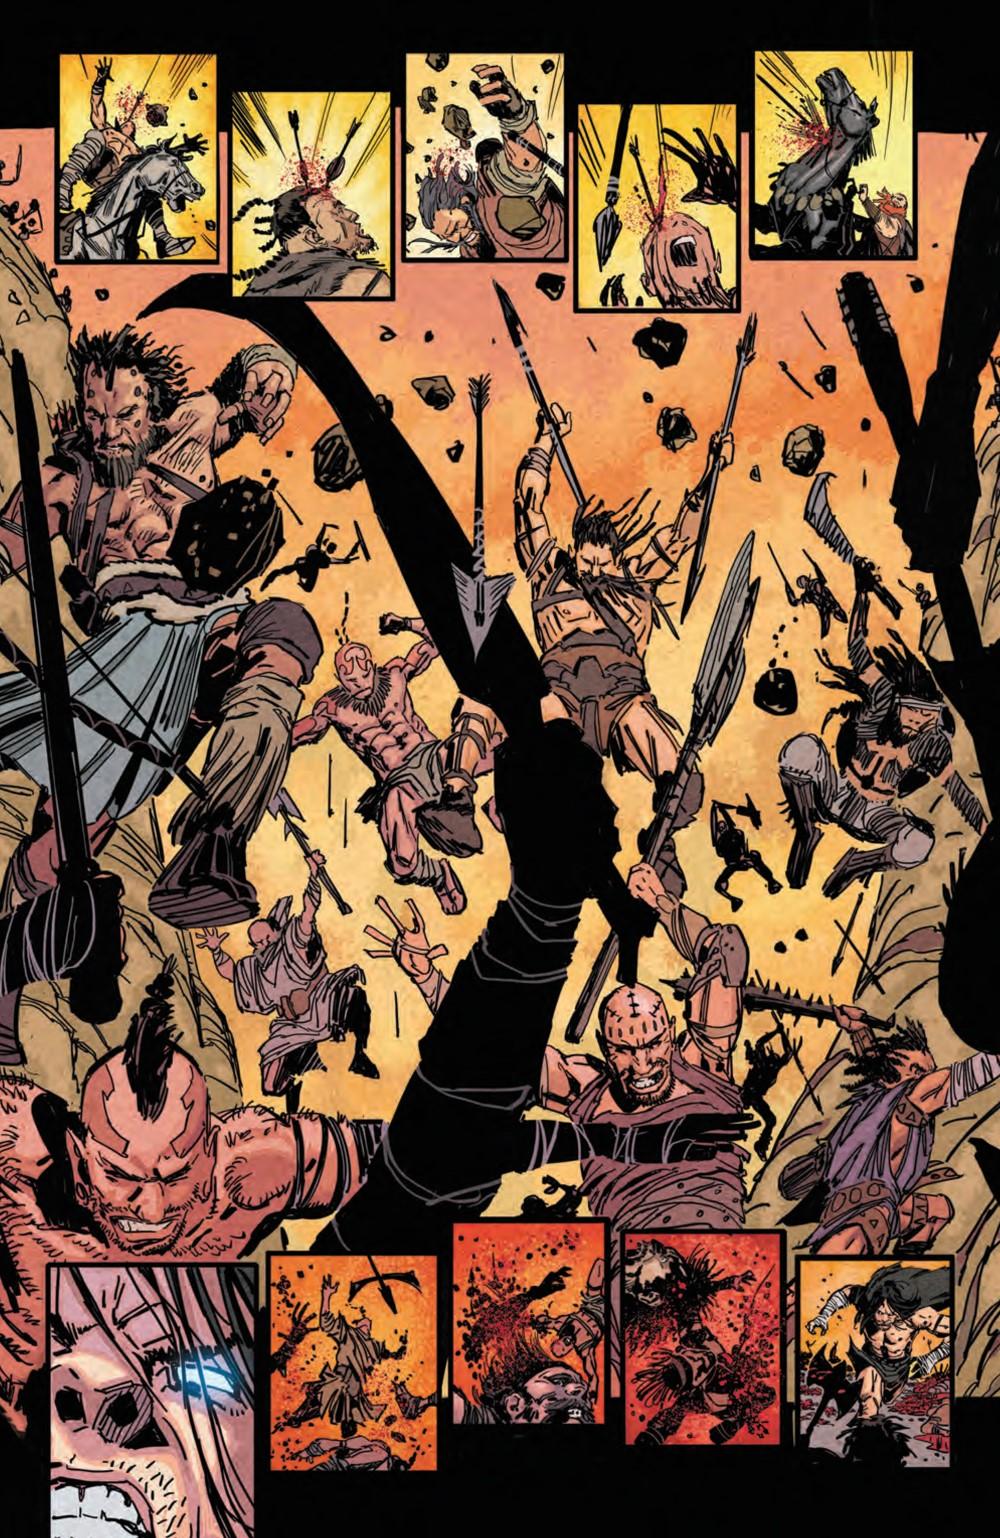 BRZRKR_004_PRESS_8 ComicList Previews: BRZRKR #4 (OF 12)